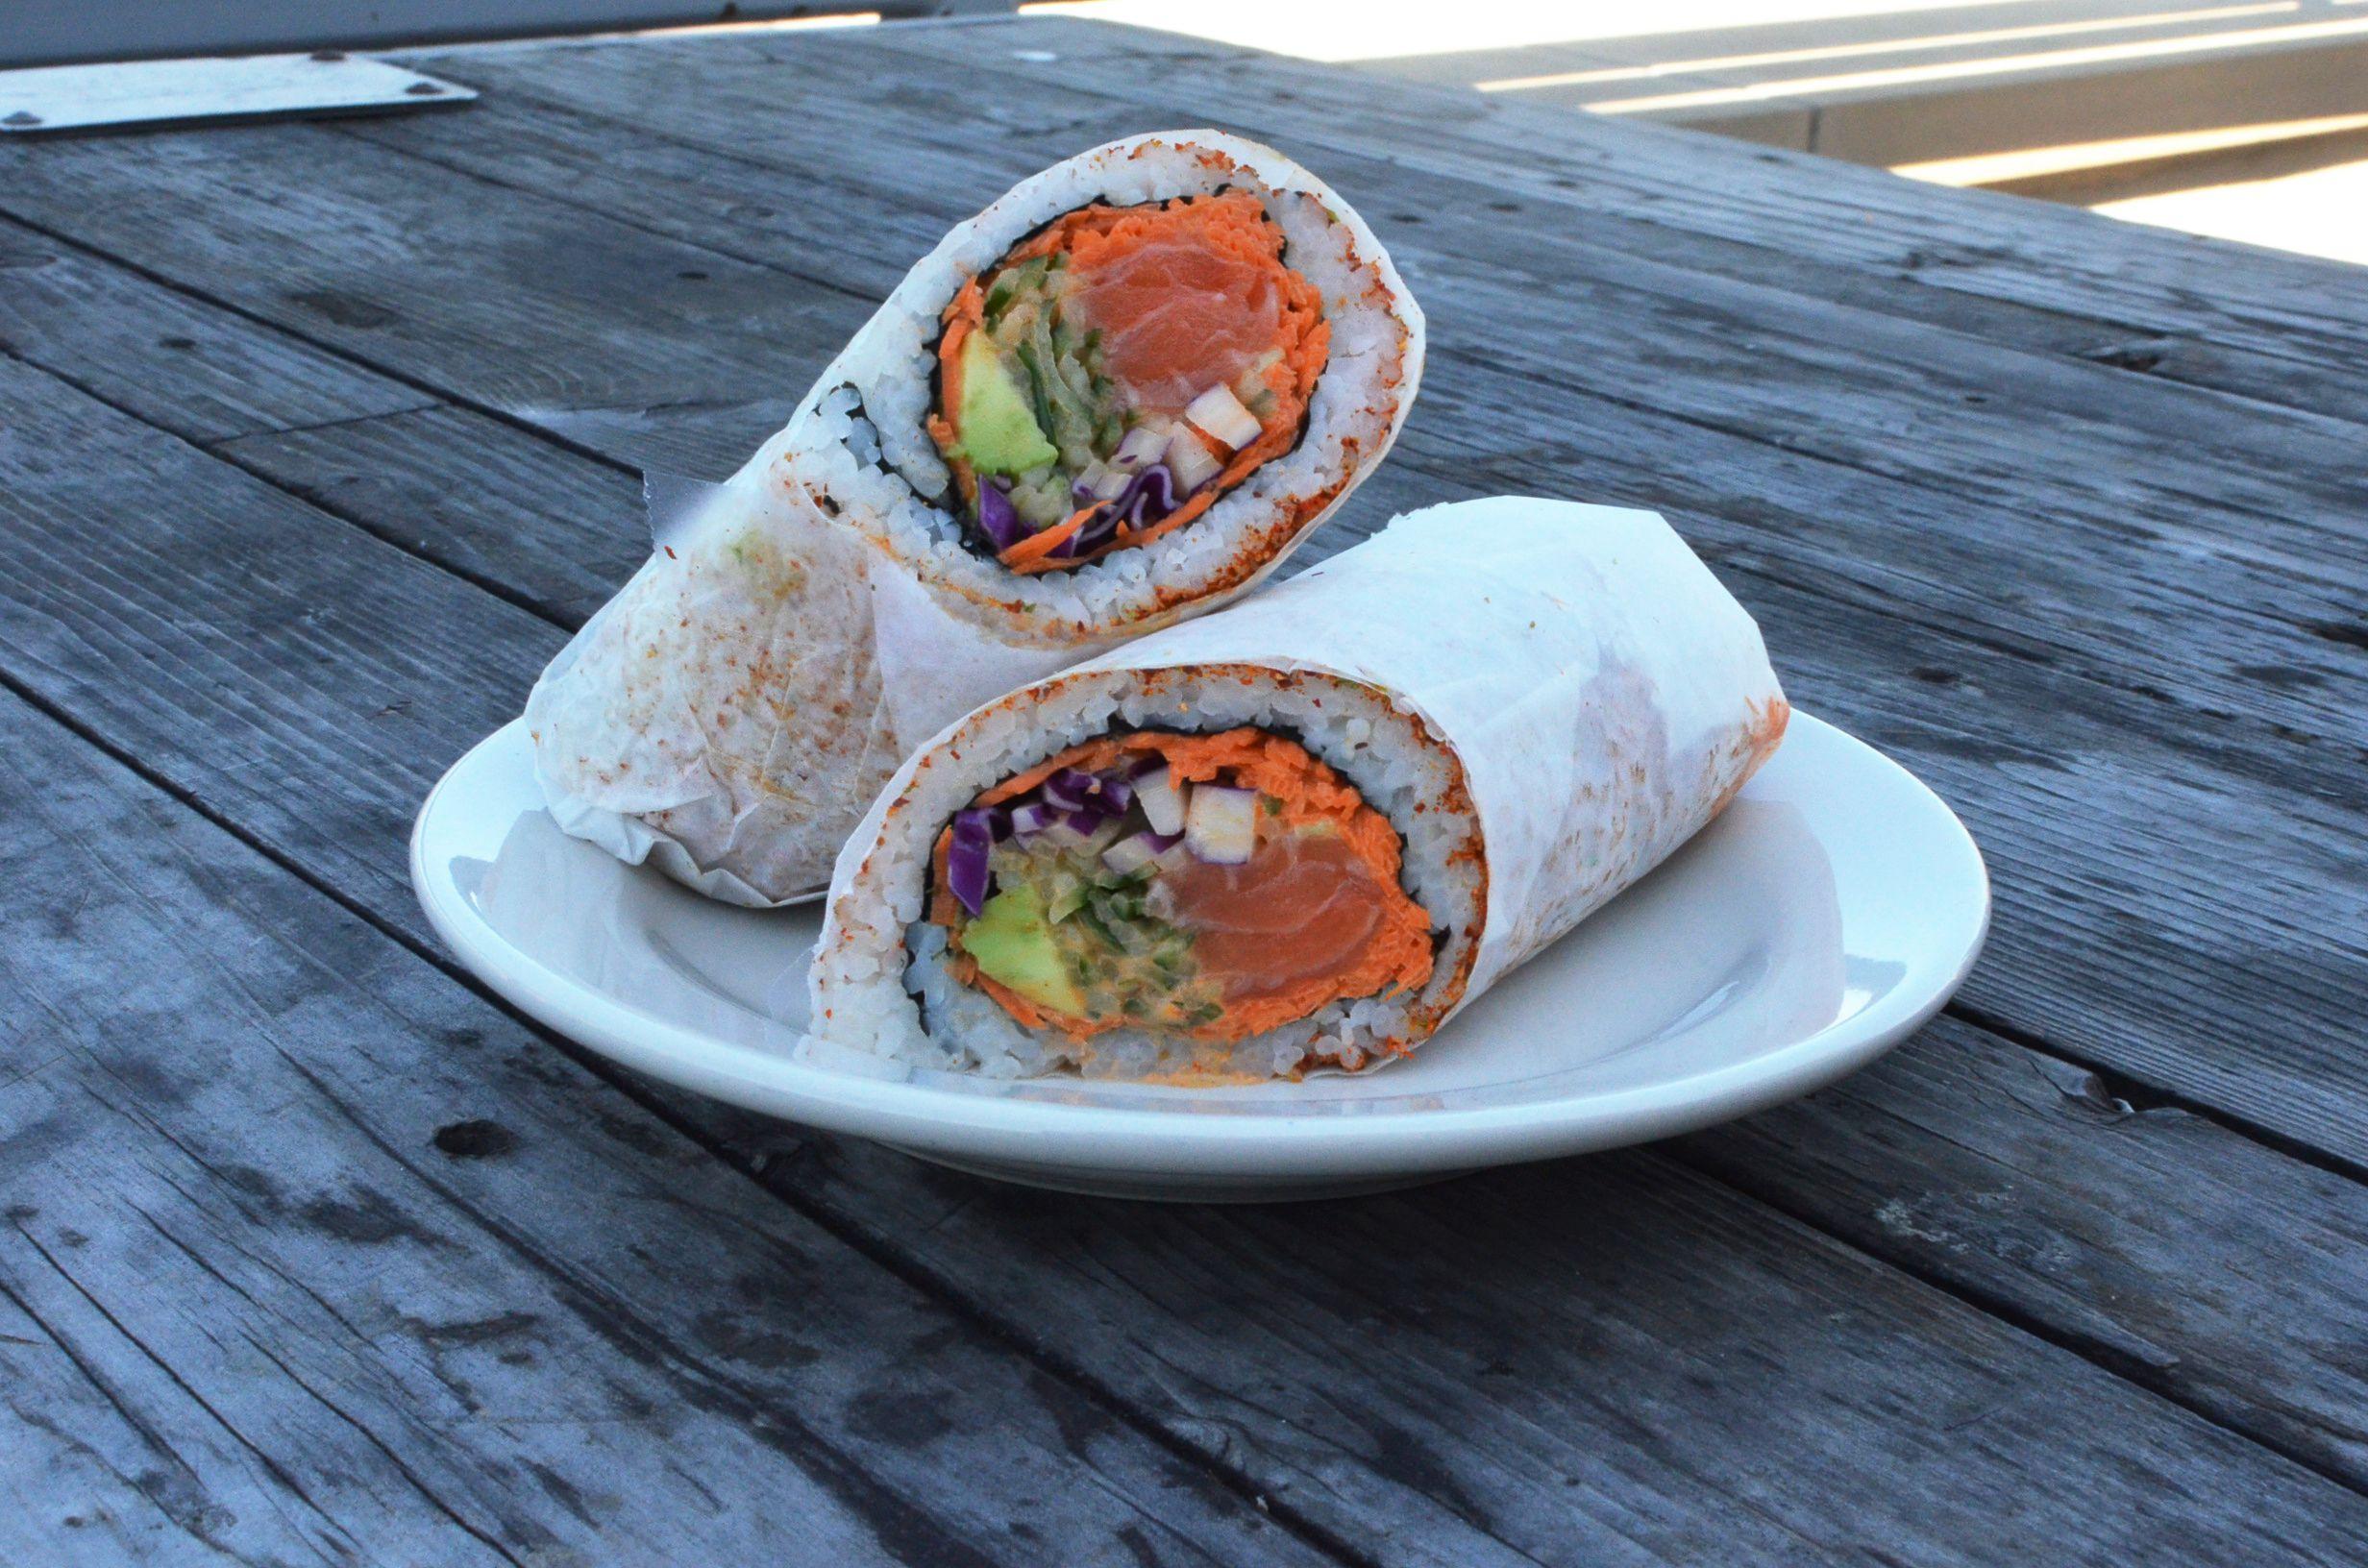 Whole Foods Sushi Burrito Austin Style Restaurant In D C